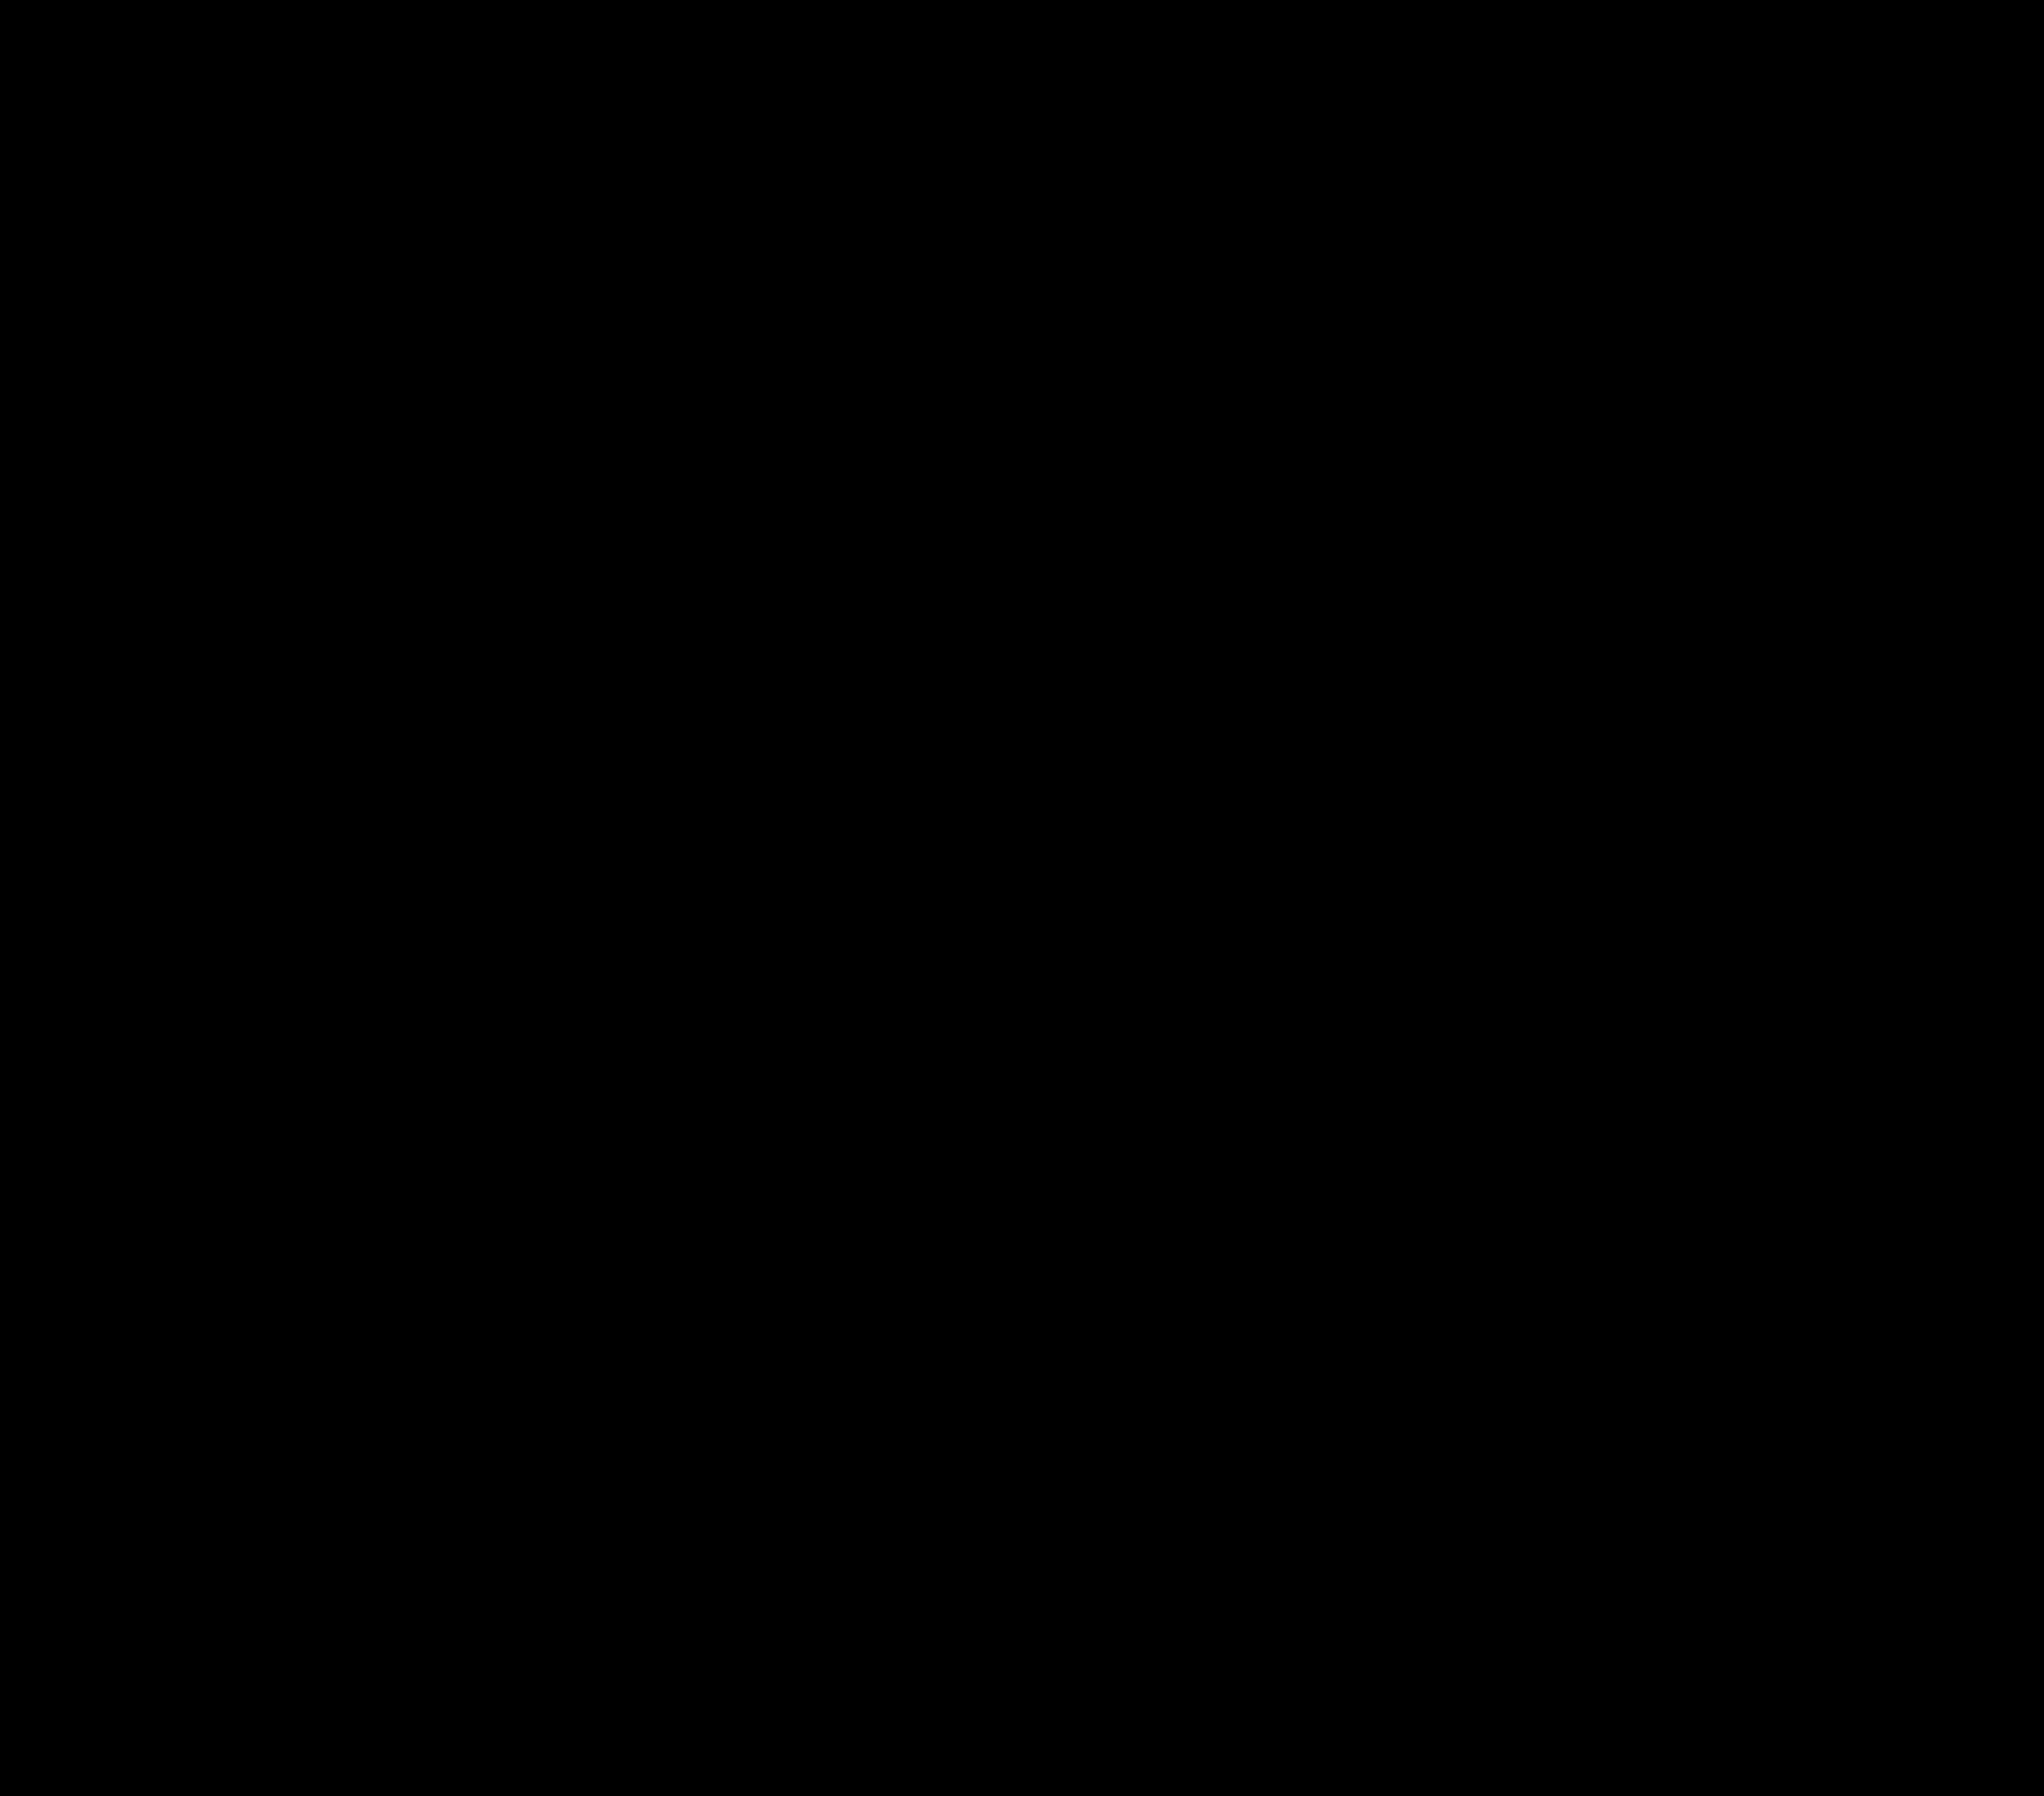 Black Mom PNG - 152594